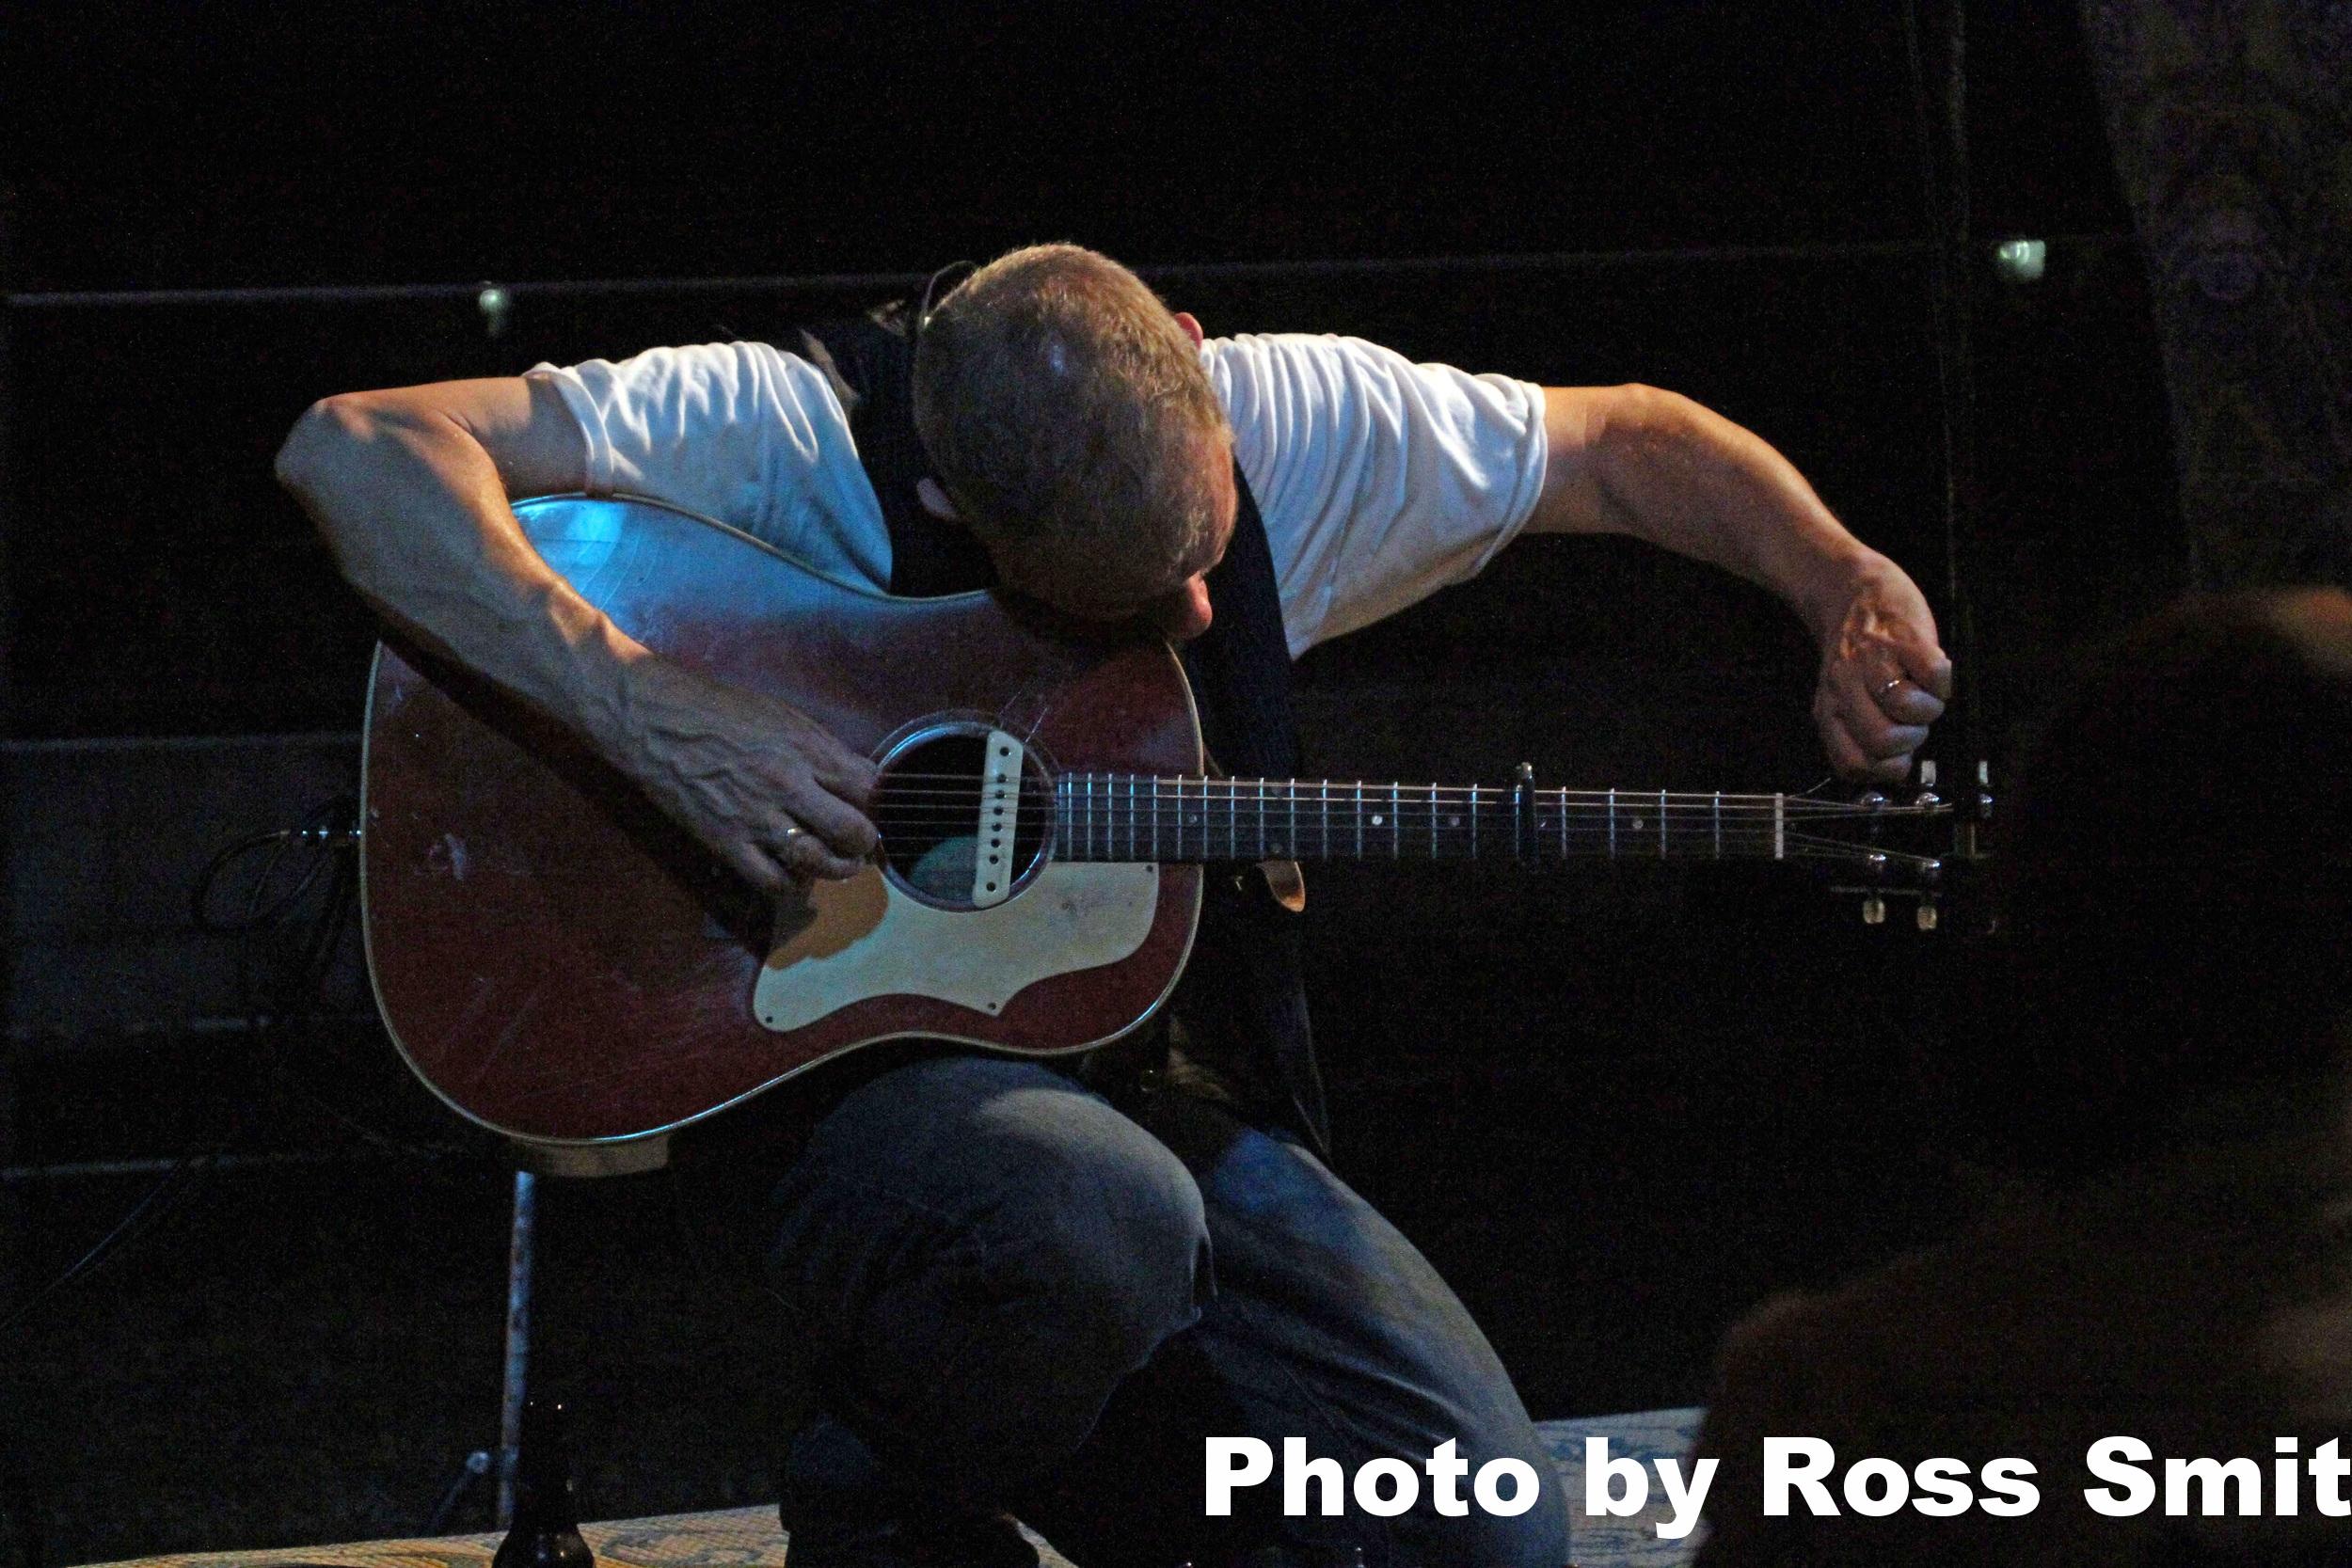 NY Guitarist Stephen Murphy